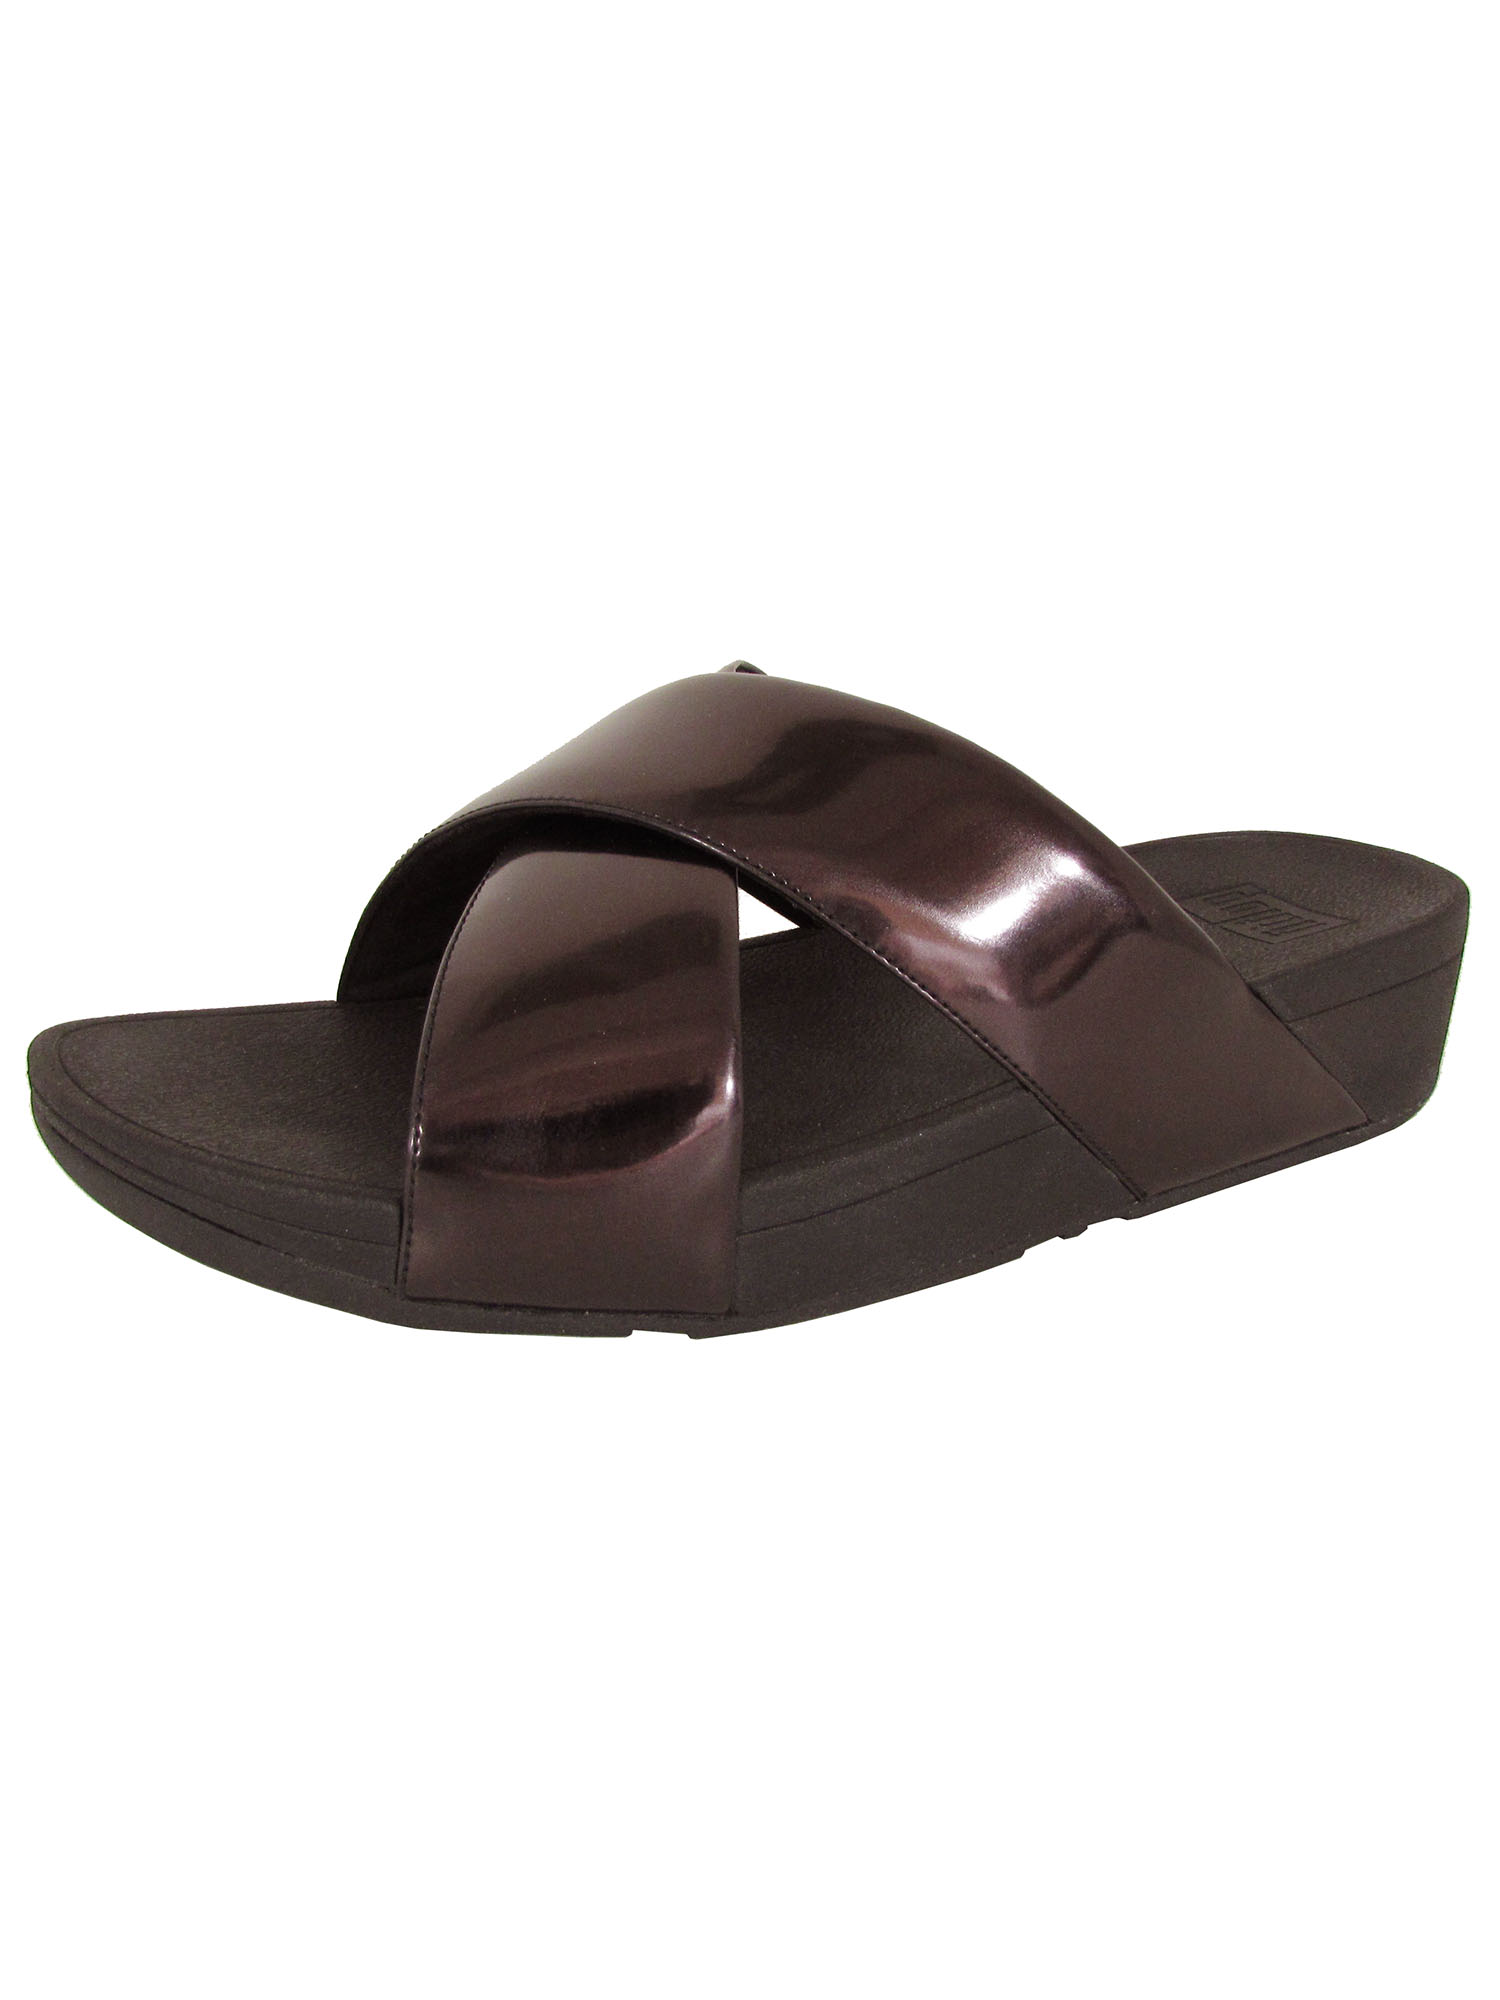 FitFlop Womens Flip-flops - Walmart.com